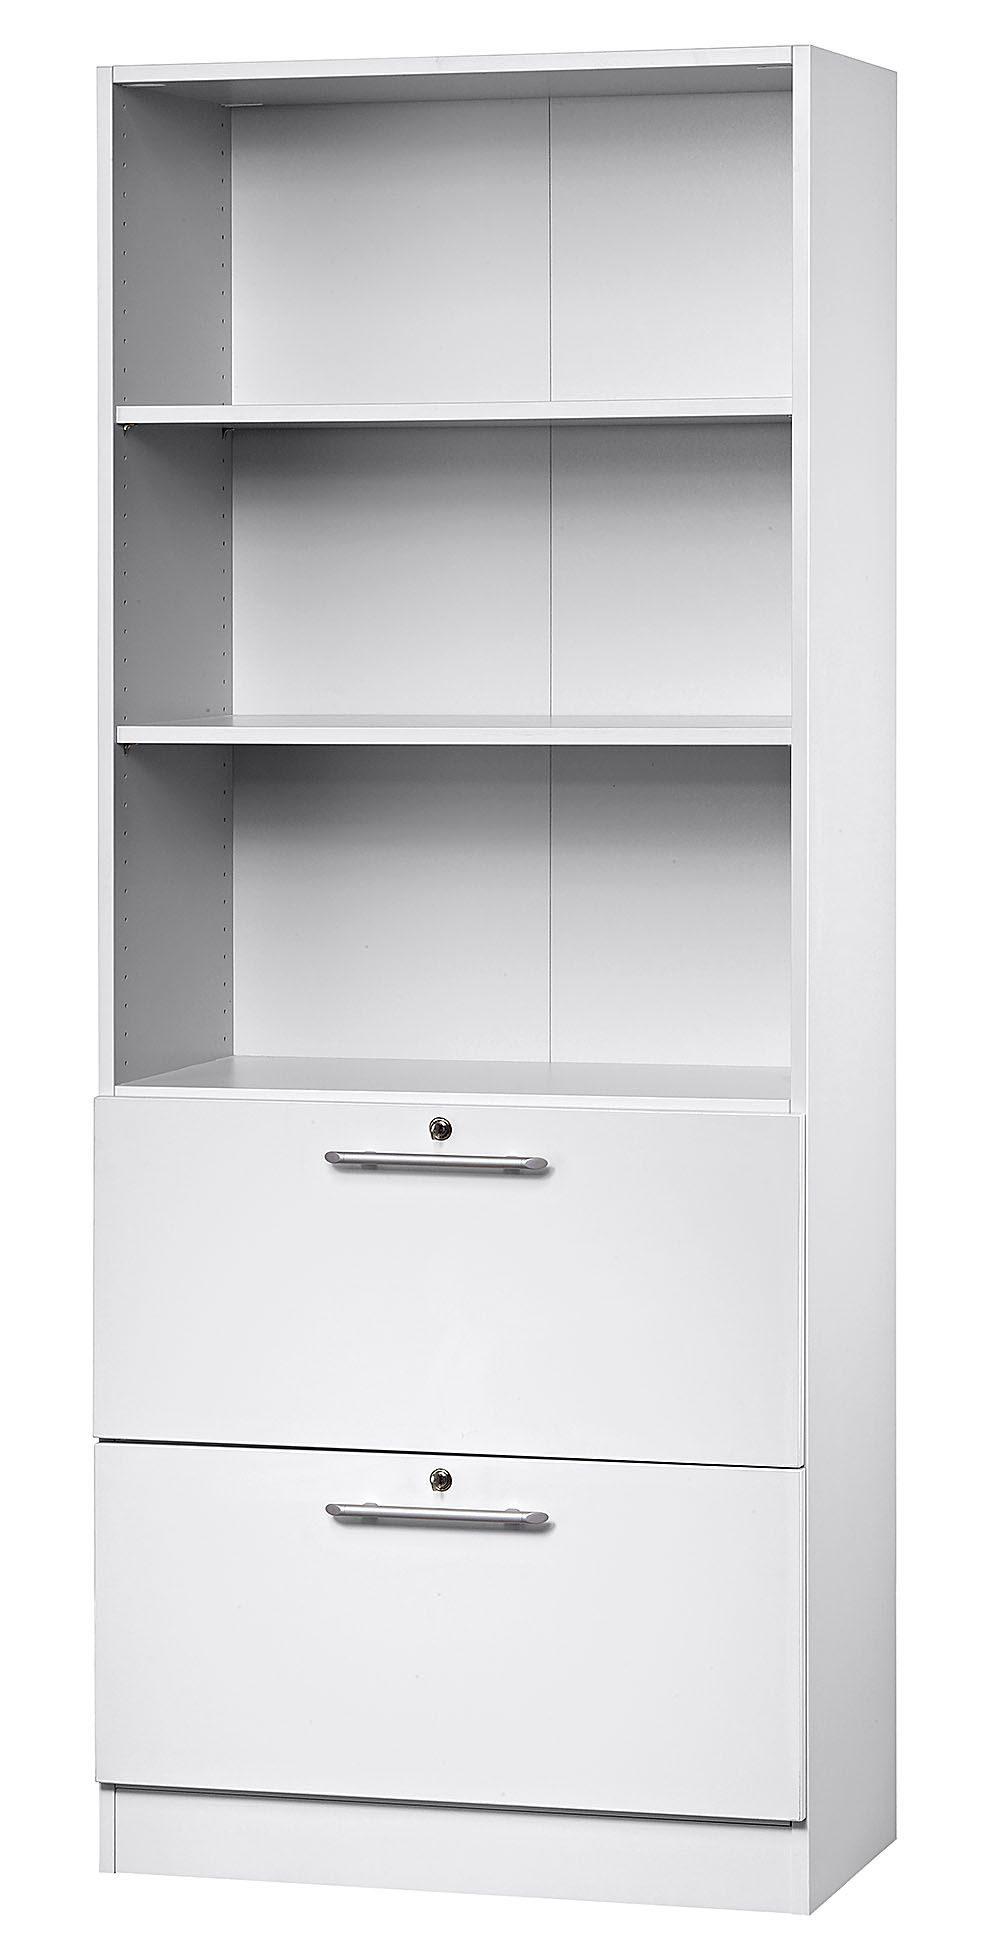 Büroschrank weiß robuster Büroschrank mit 2 separat abschließbaren DIN A4 ...